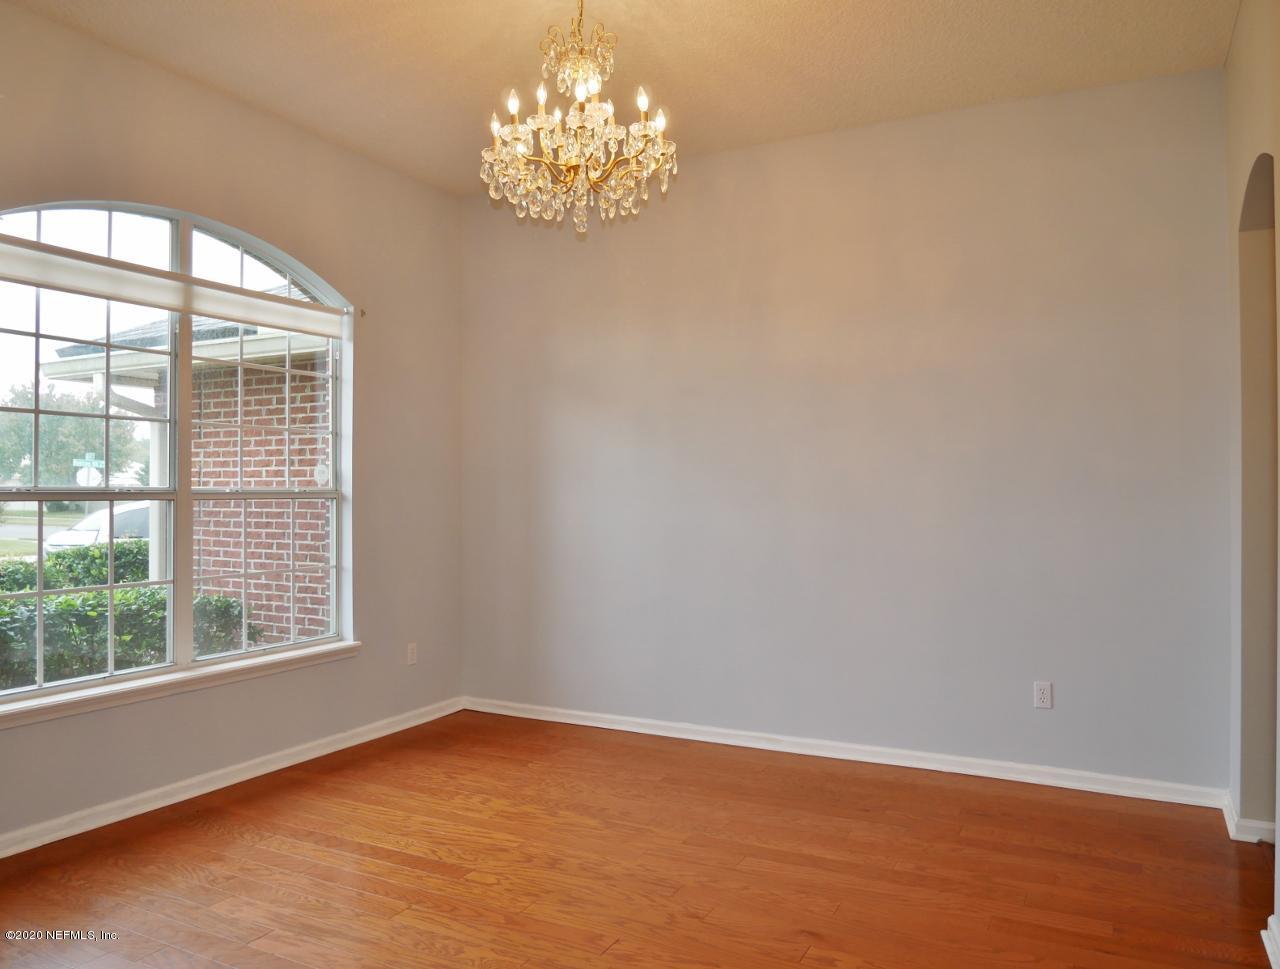 9422 MAIDSTONE MILL, JACKSONVILLE, FLORIDA 32244, 4 Bedrooms Bedrooms, ,2 BathroomsBathrooms,Rental,For Rent,MAIDSTONE MILL,1081589